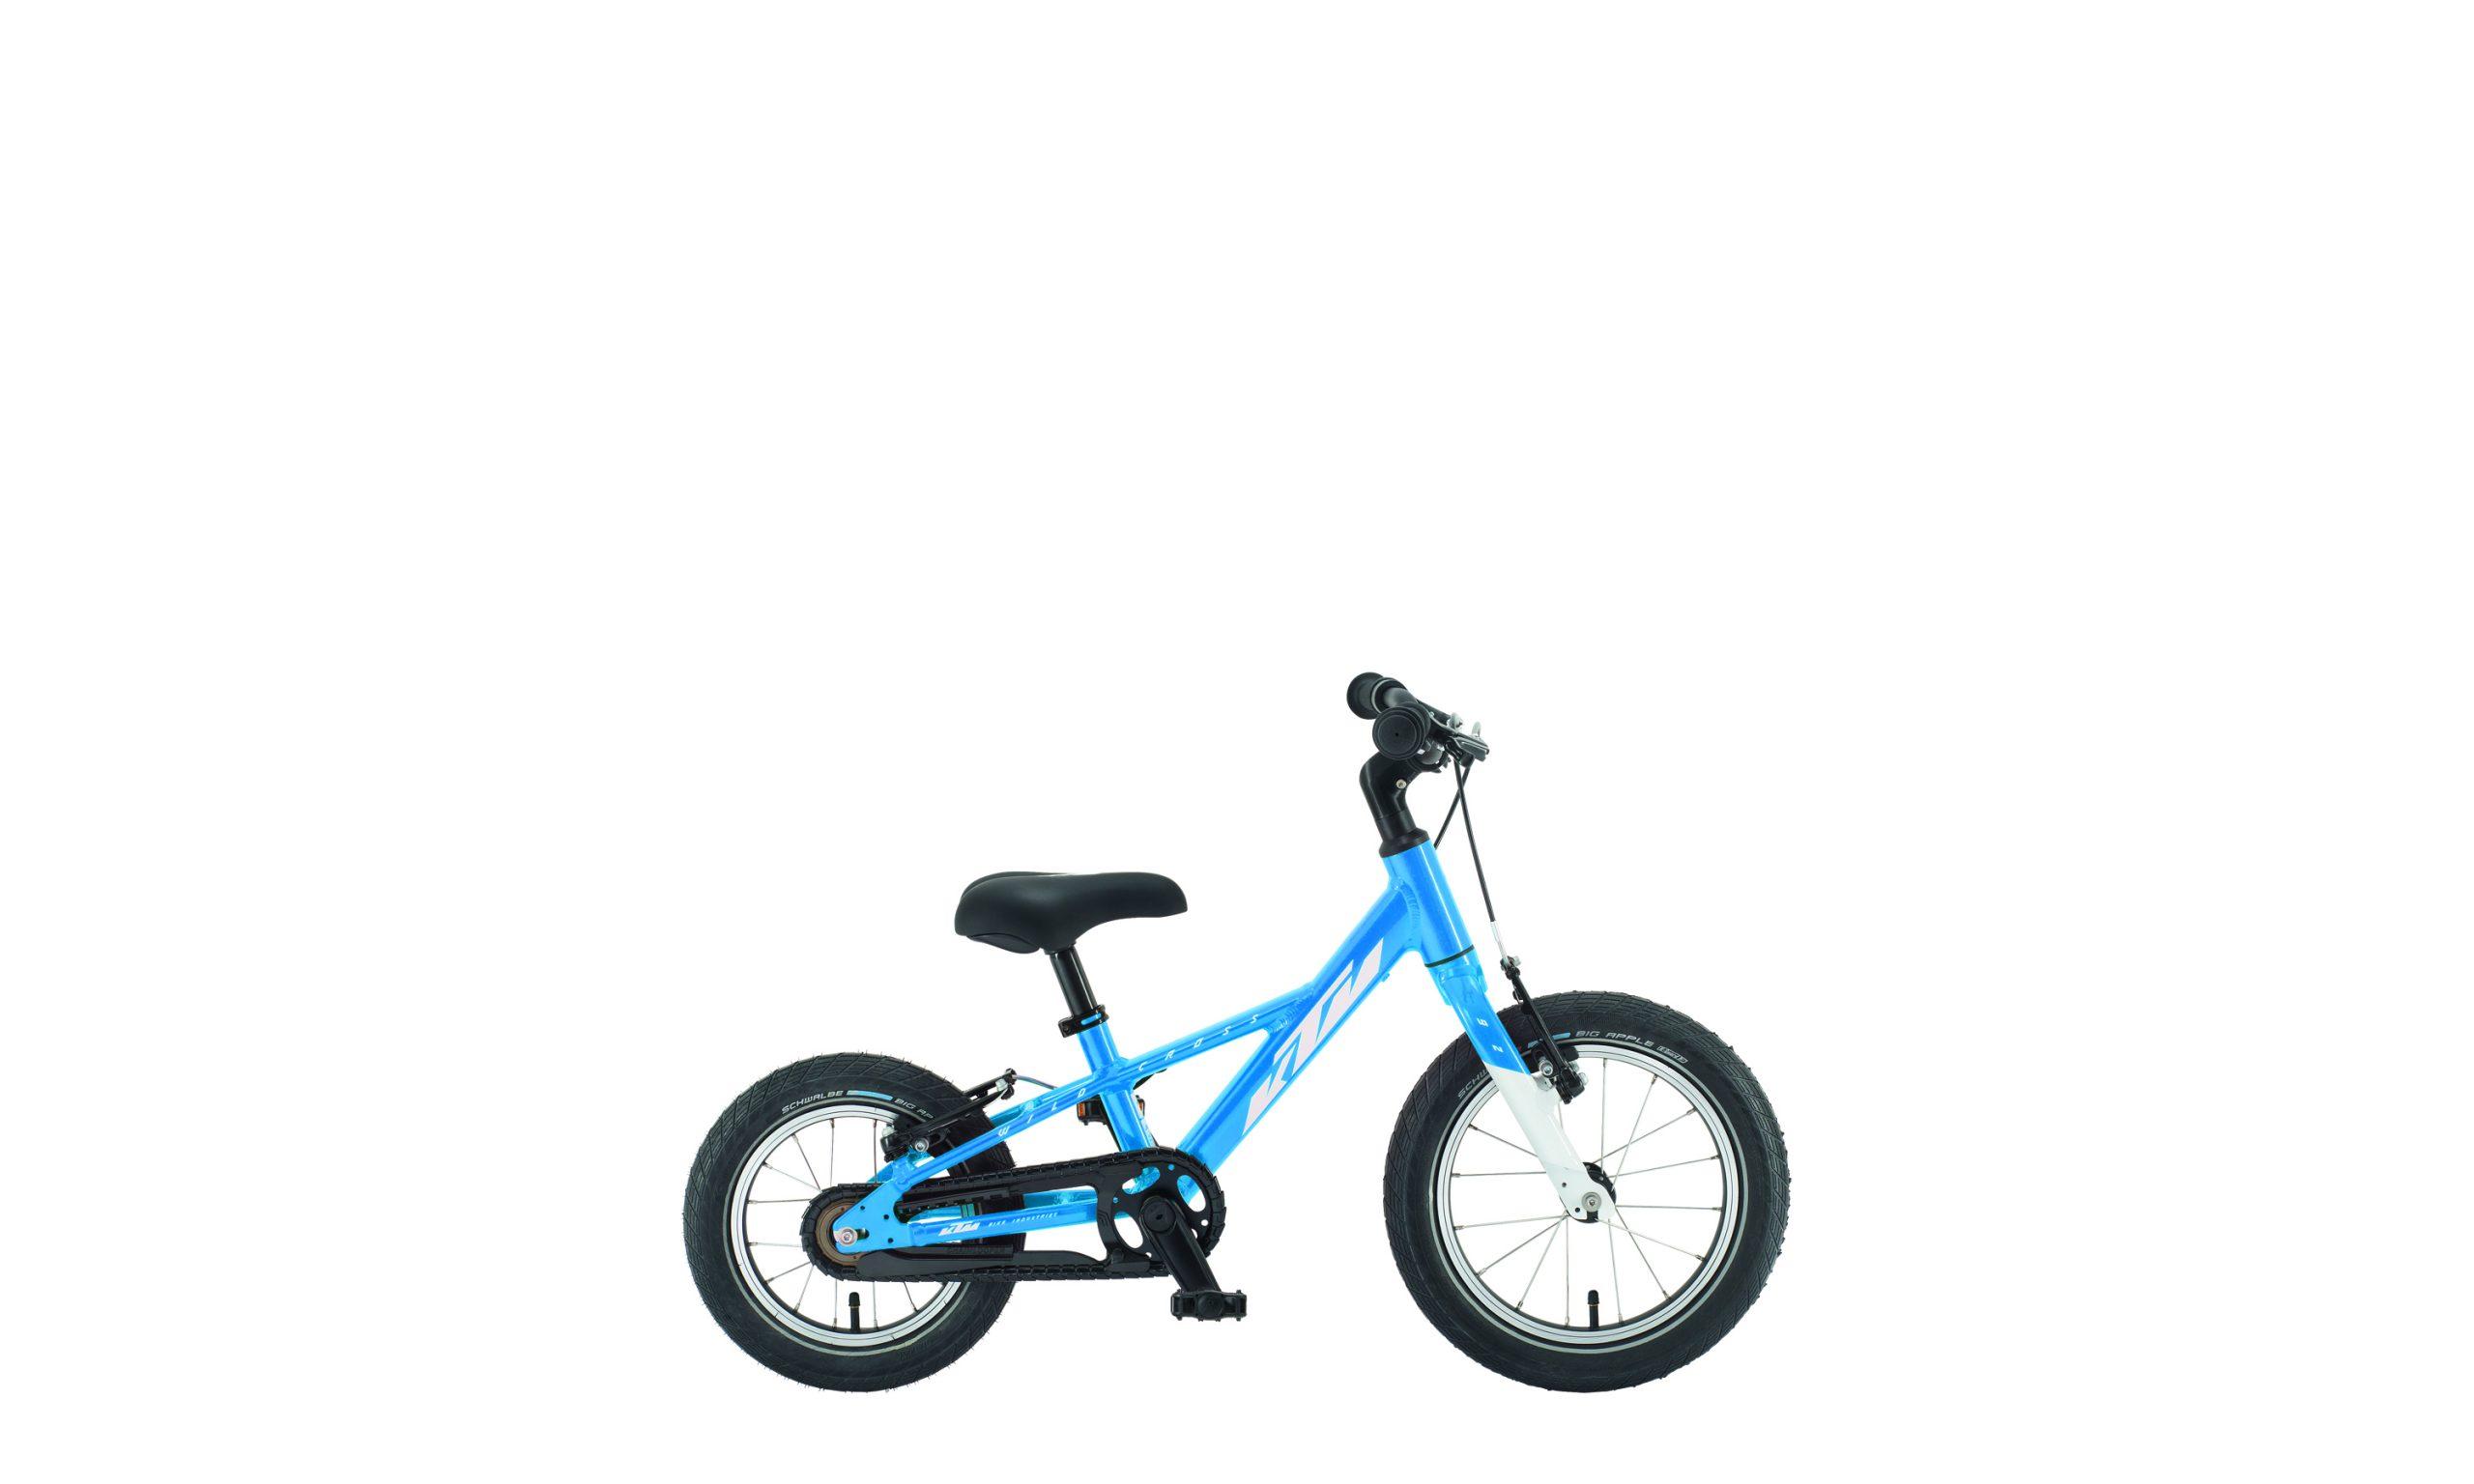 KTM Bike - WILD CROSS 12 blue